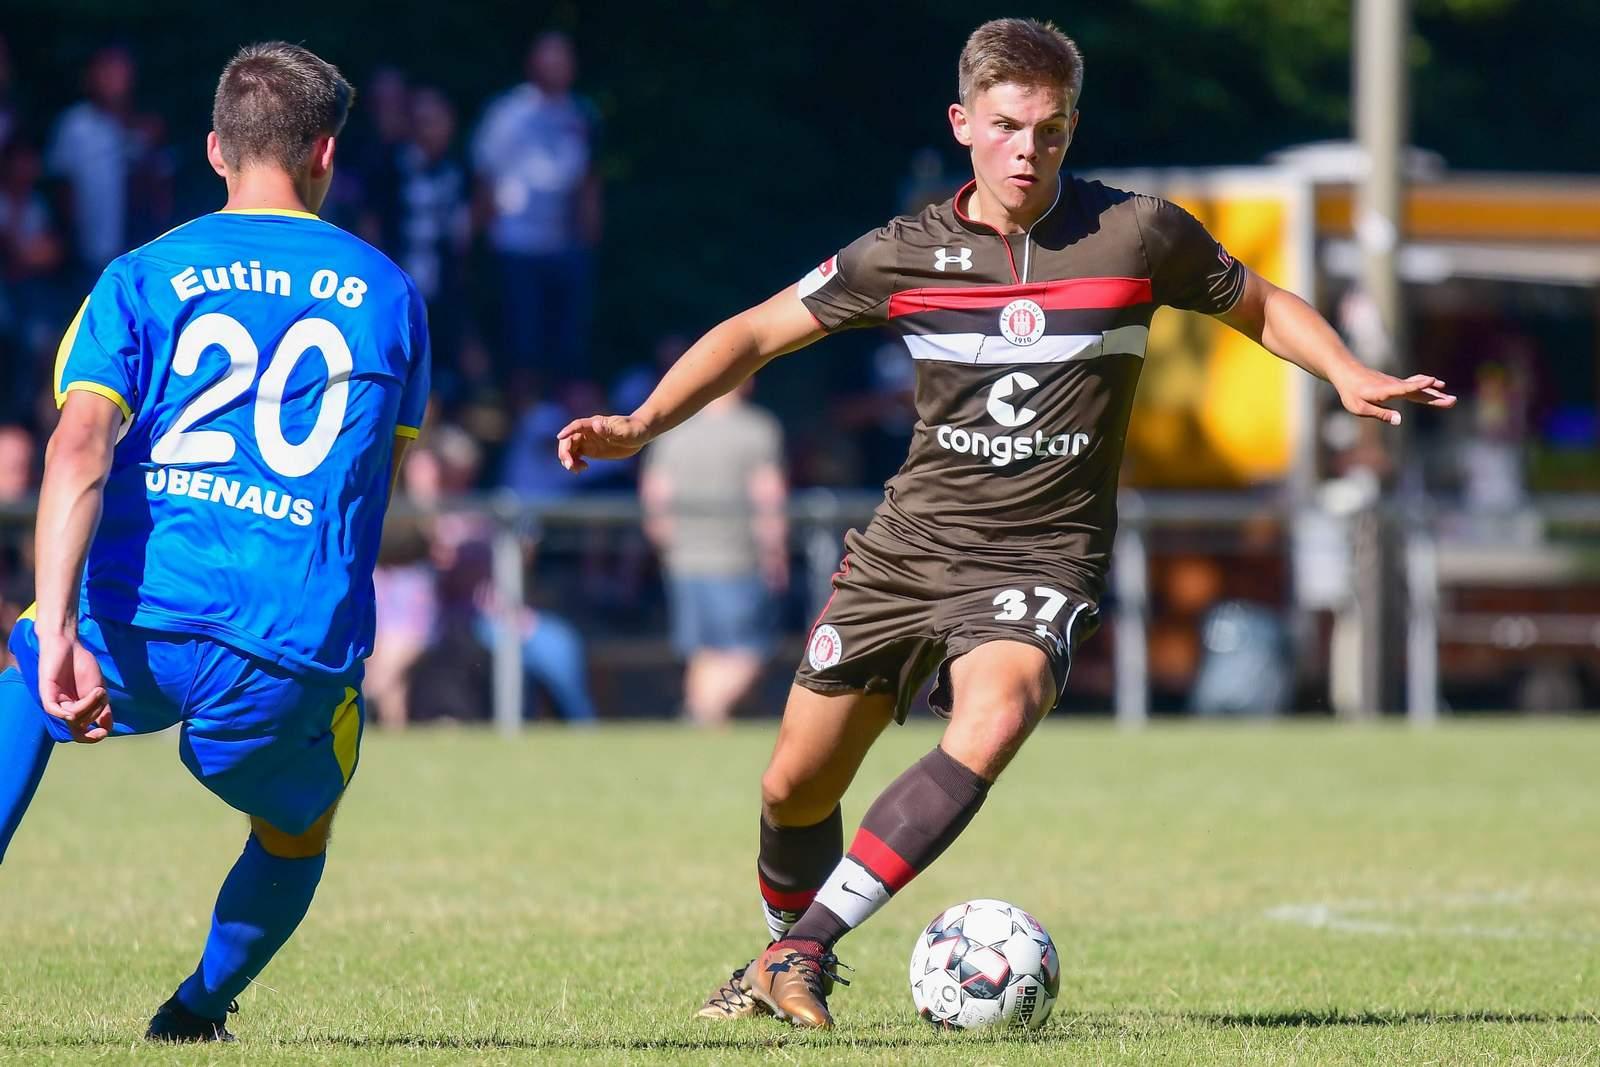 Finn Ole Becker vom FC St. Pauli